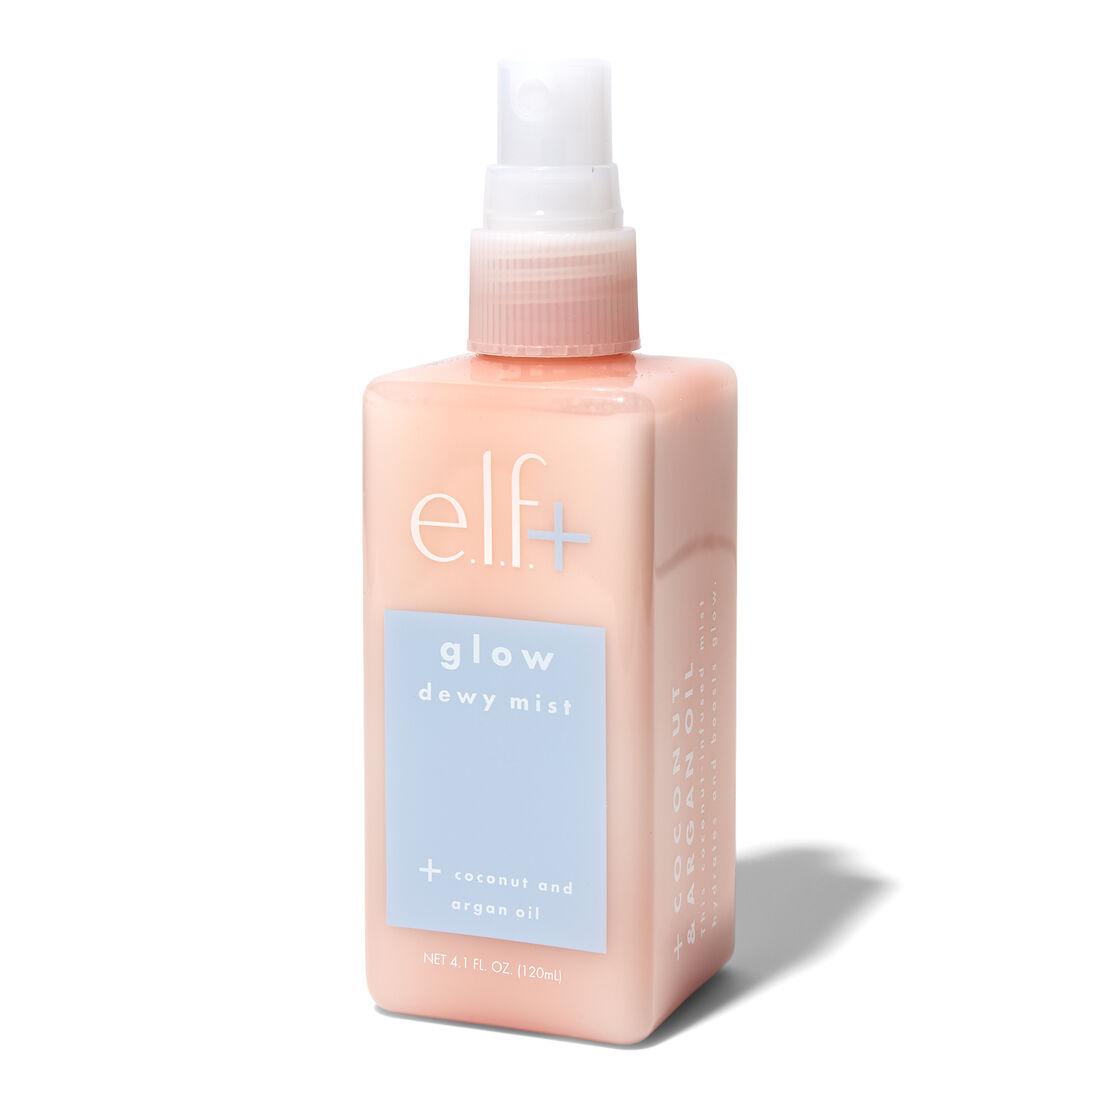 E.l.f Cosmetics - elf+ Glow Dewy Mist